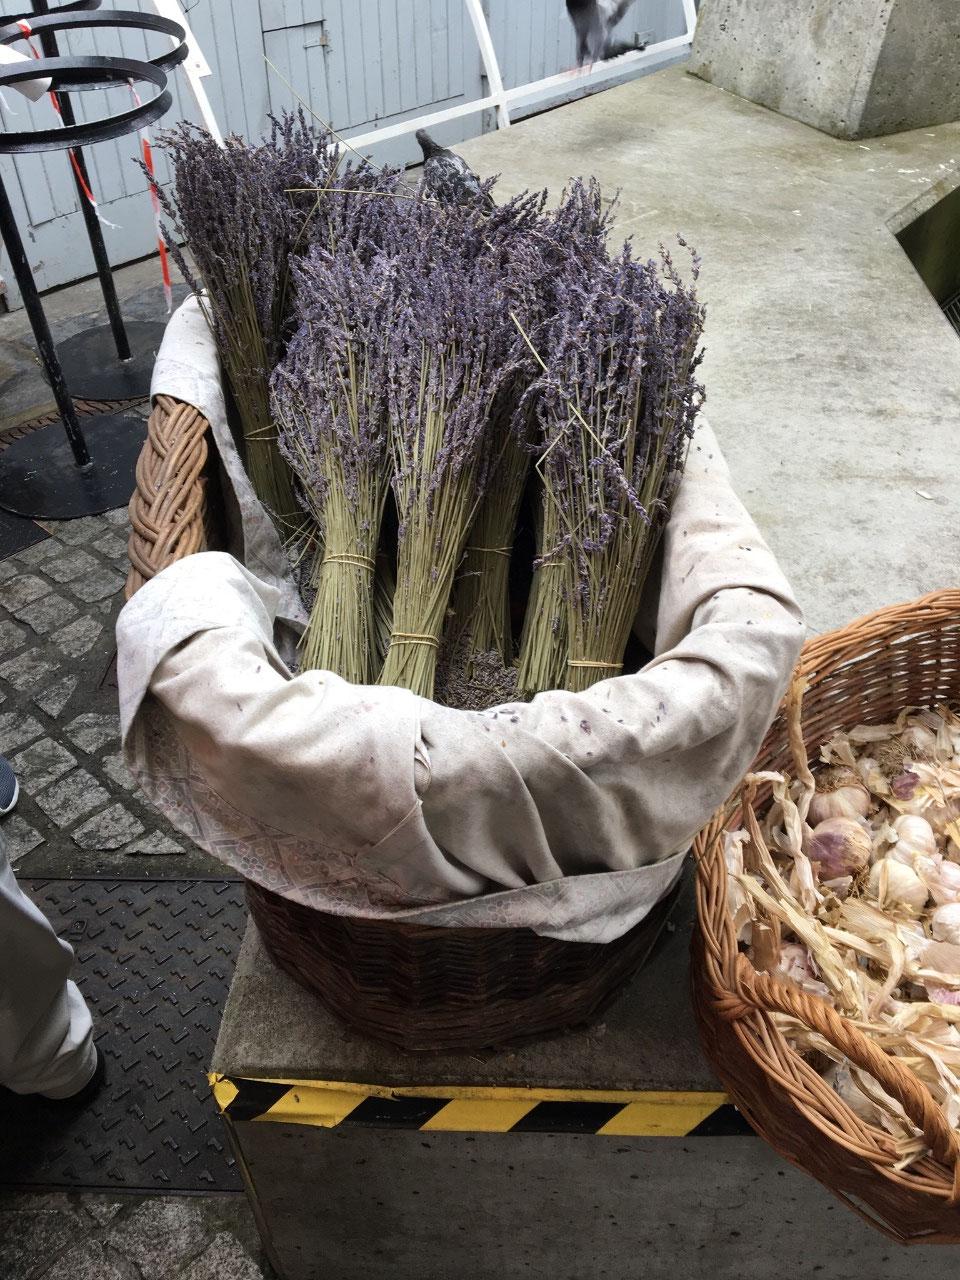 Fresh lavender at the Milk Market